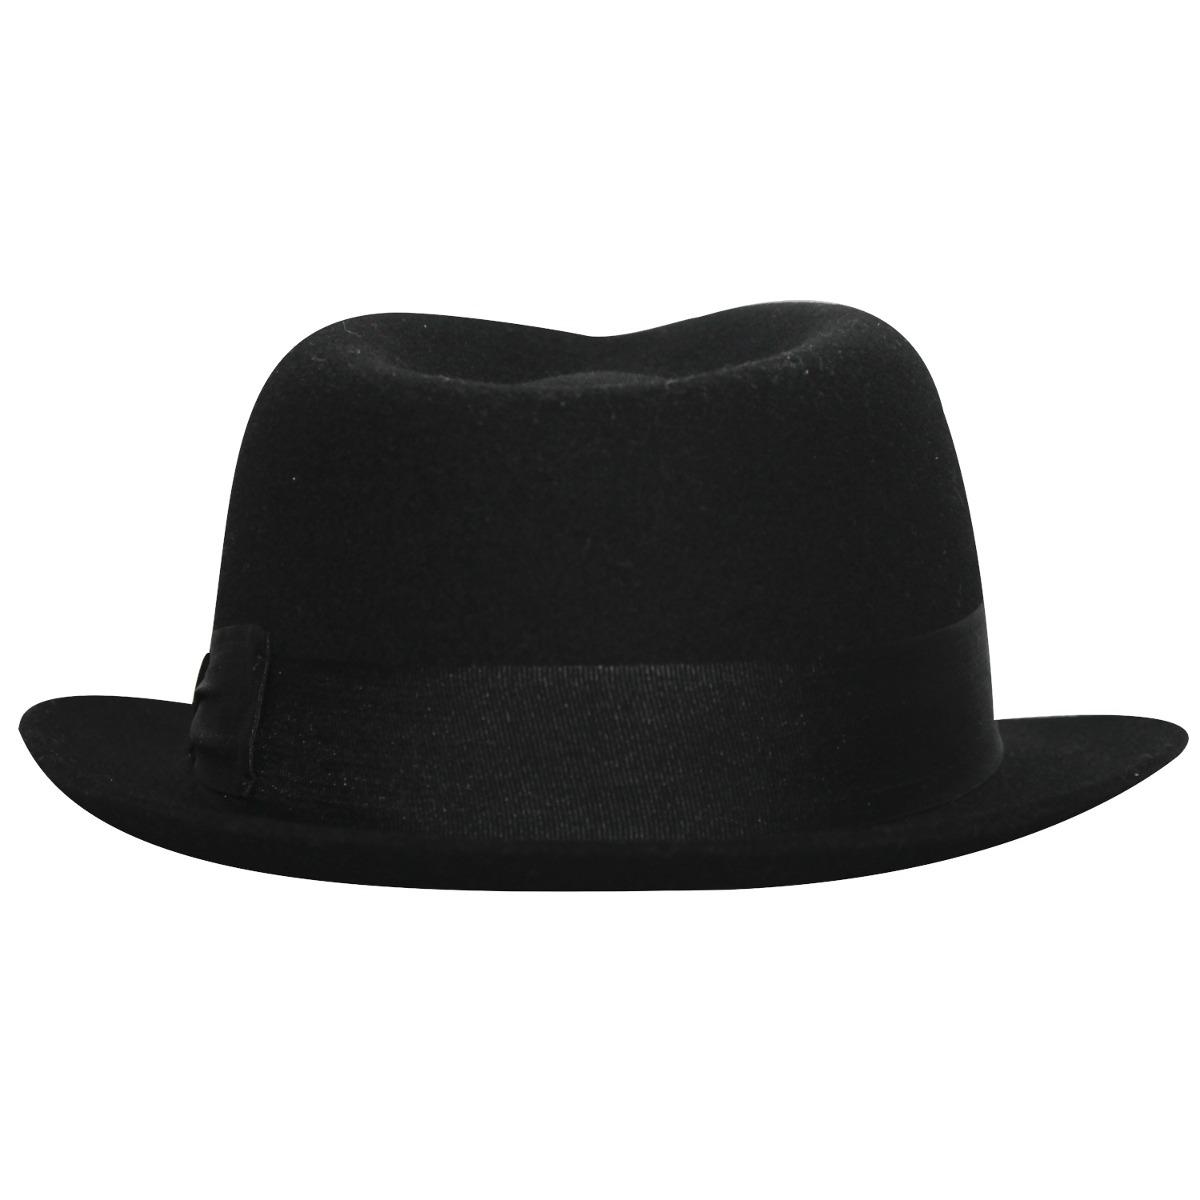 chapéu fedora aba curta preto masculino. Carregando zoom. 2fb5986ec9c